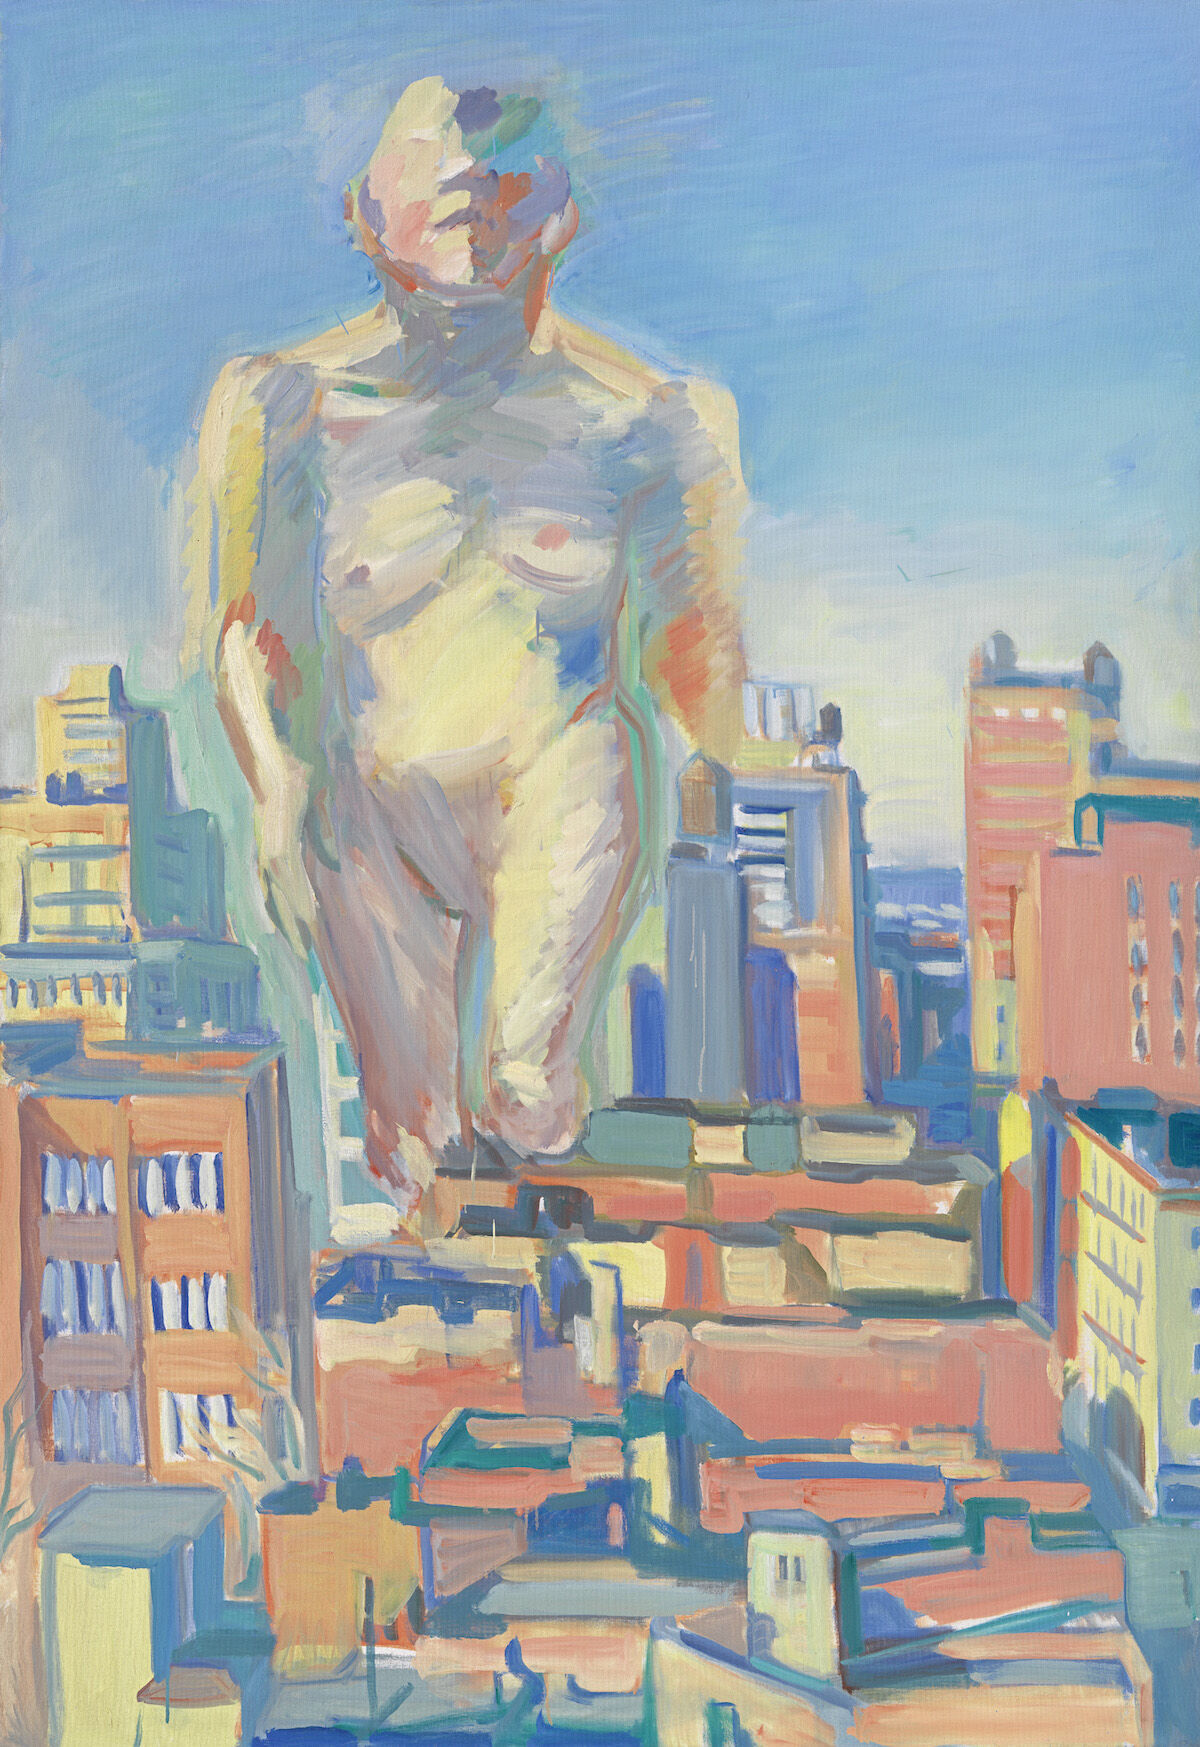 Maria Lassnig, Woman Power, 1979. Courtesy Albertina Museum, .